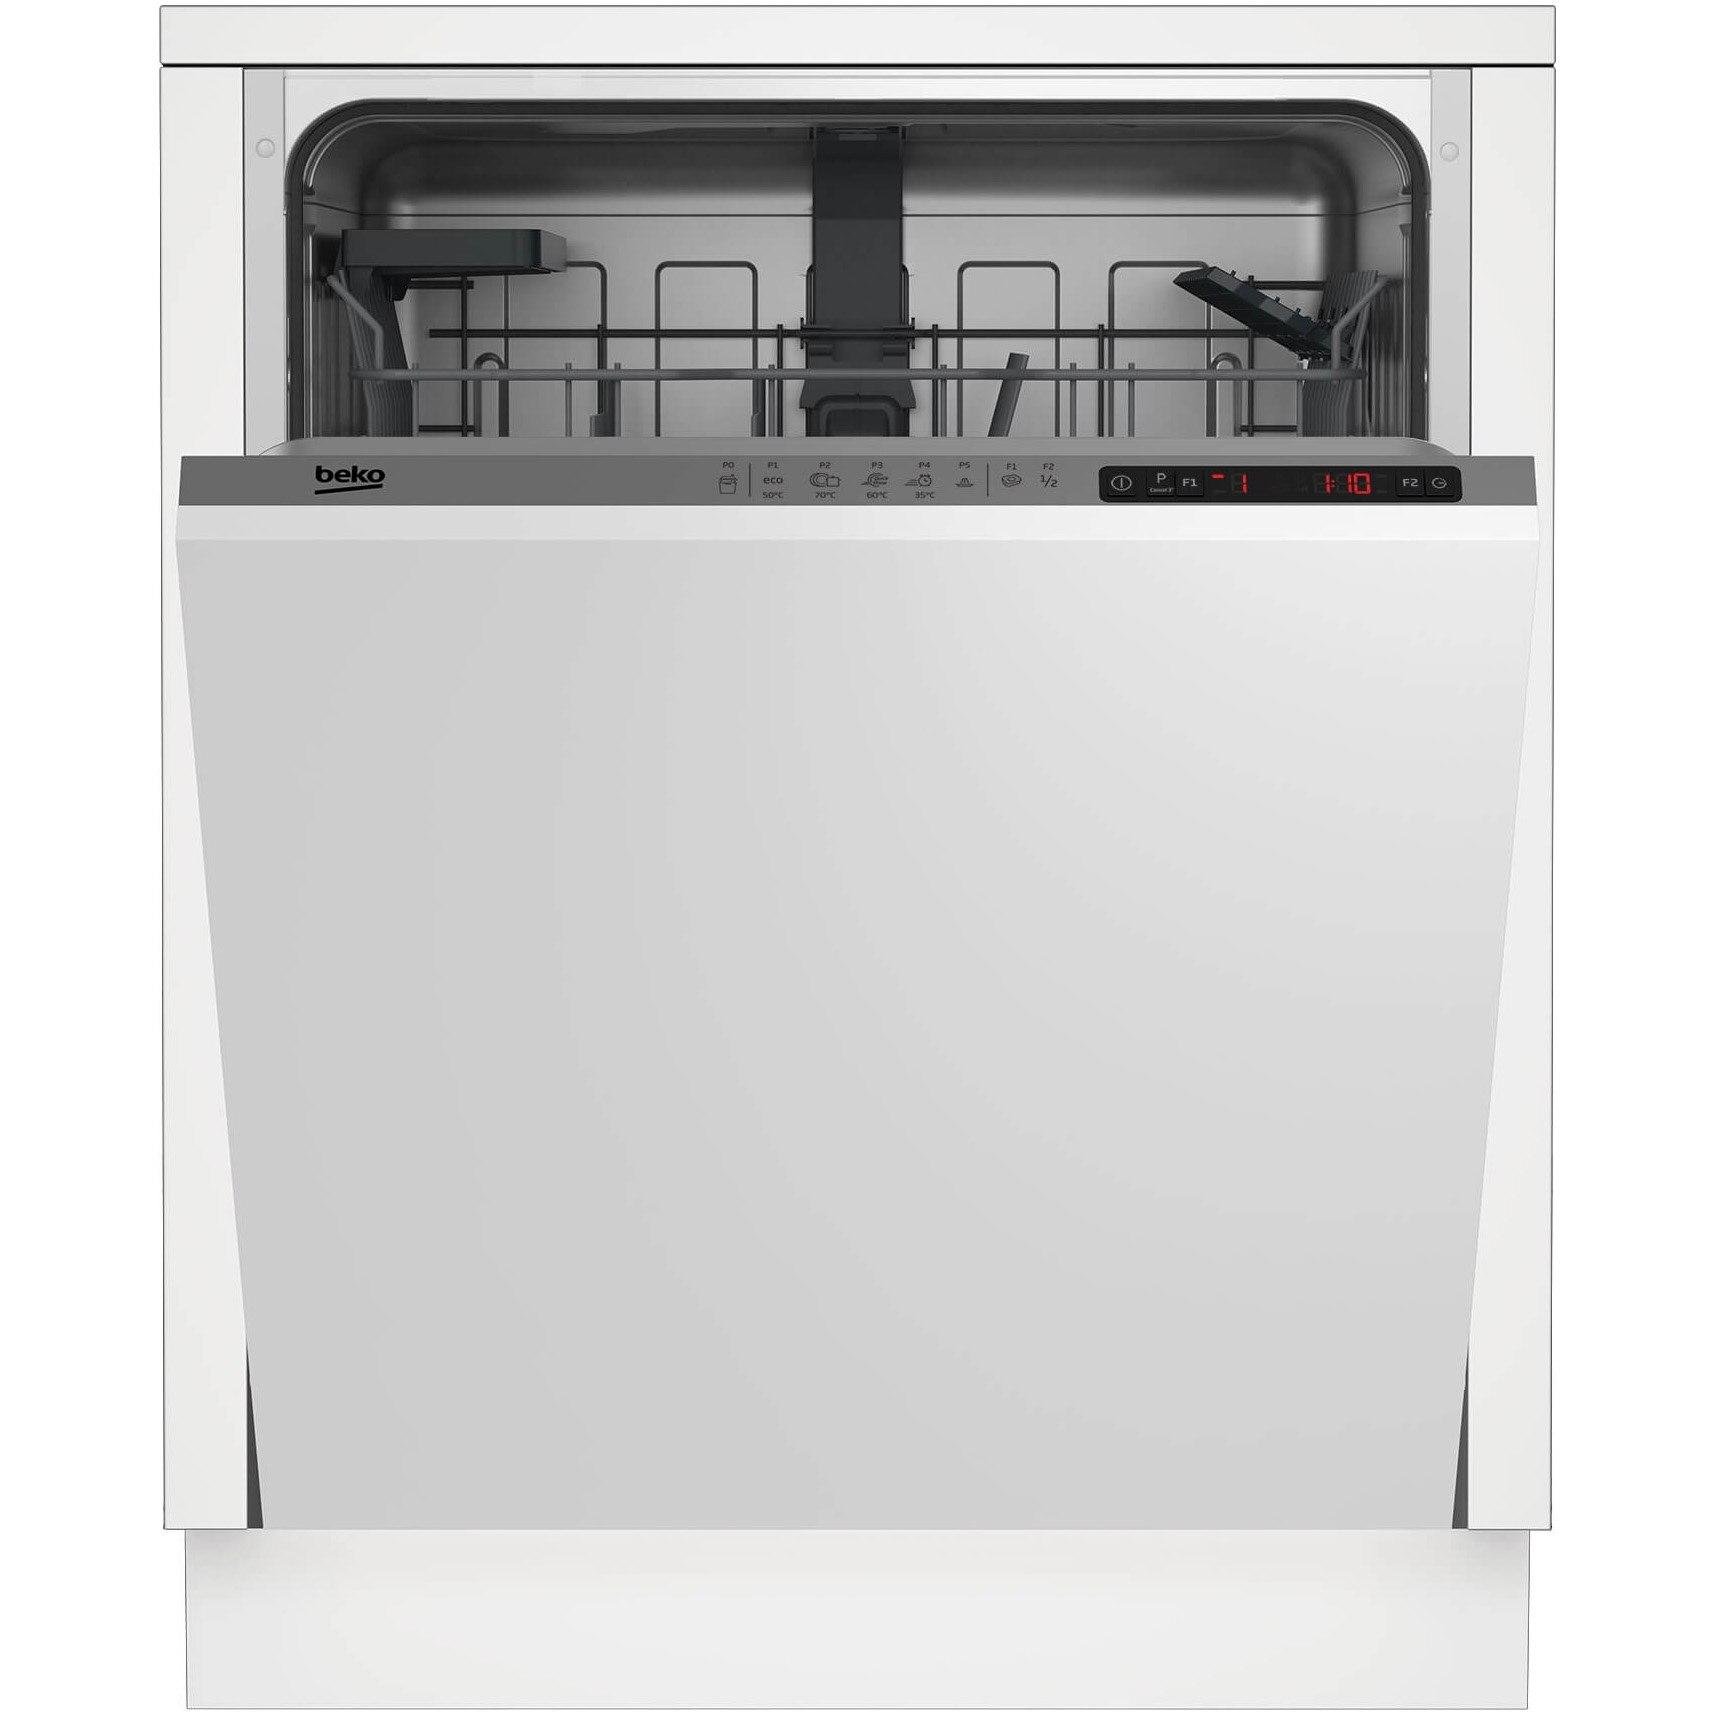 Fotografie Masina de spalat vase incorporabila Beko DIN25310, 13 seturi, 5 programe, Clasa A+, 60 cm